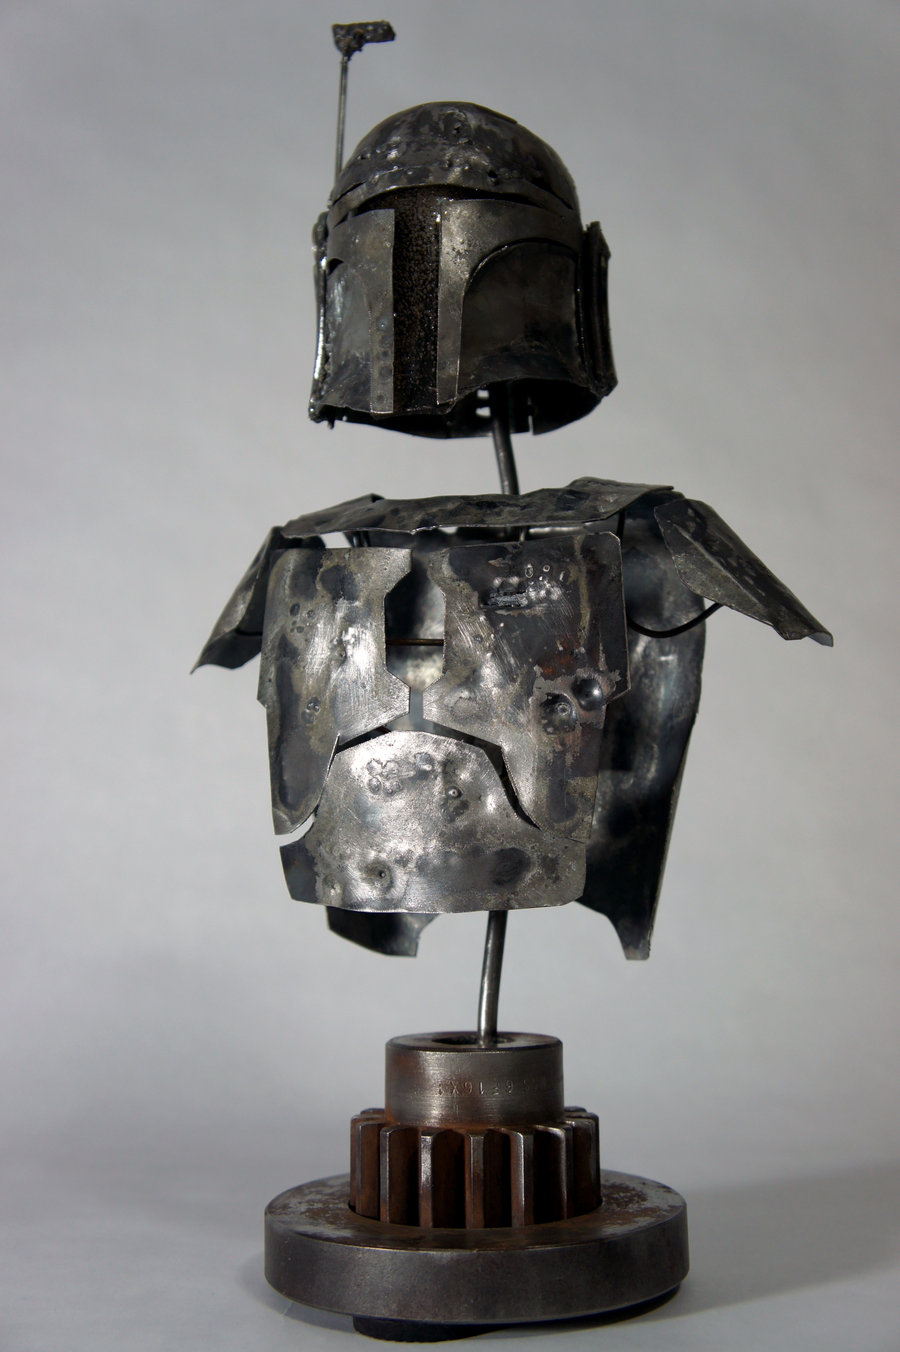 Scrap metal Boba Fett